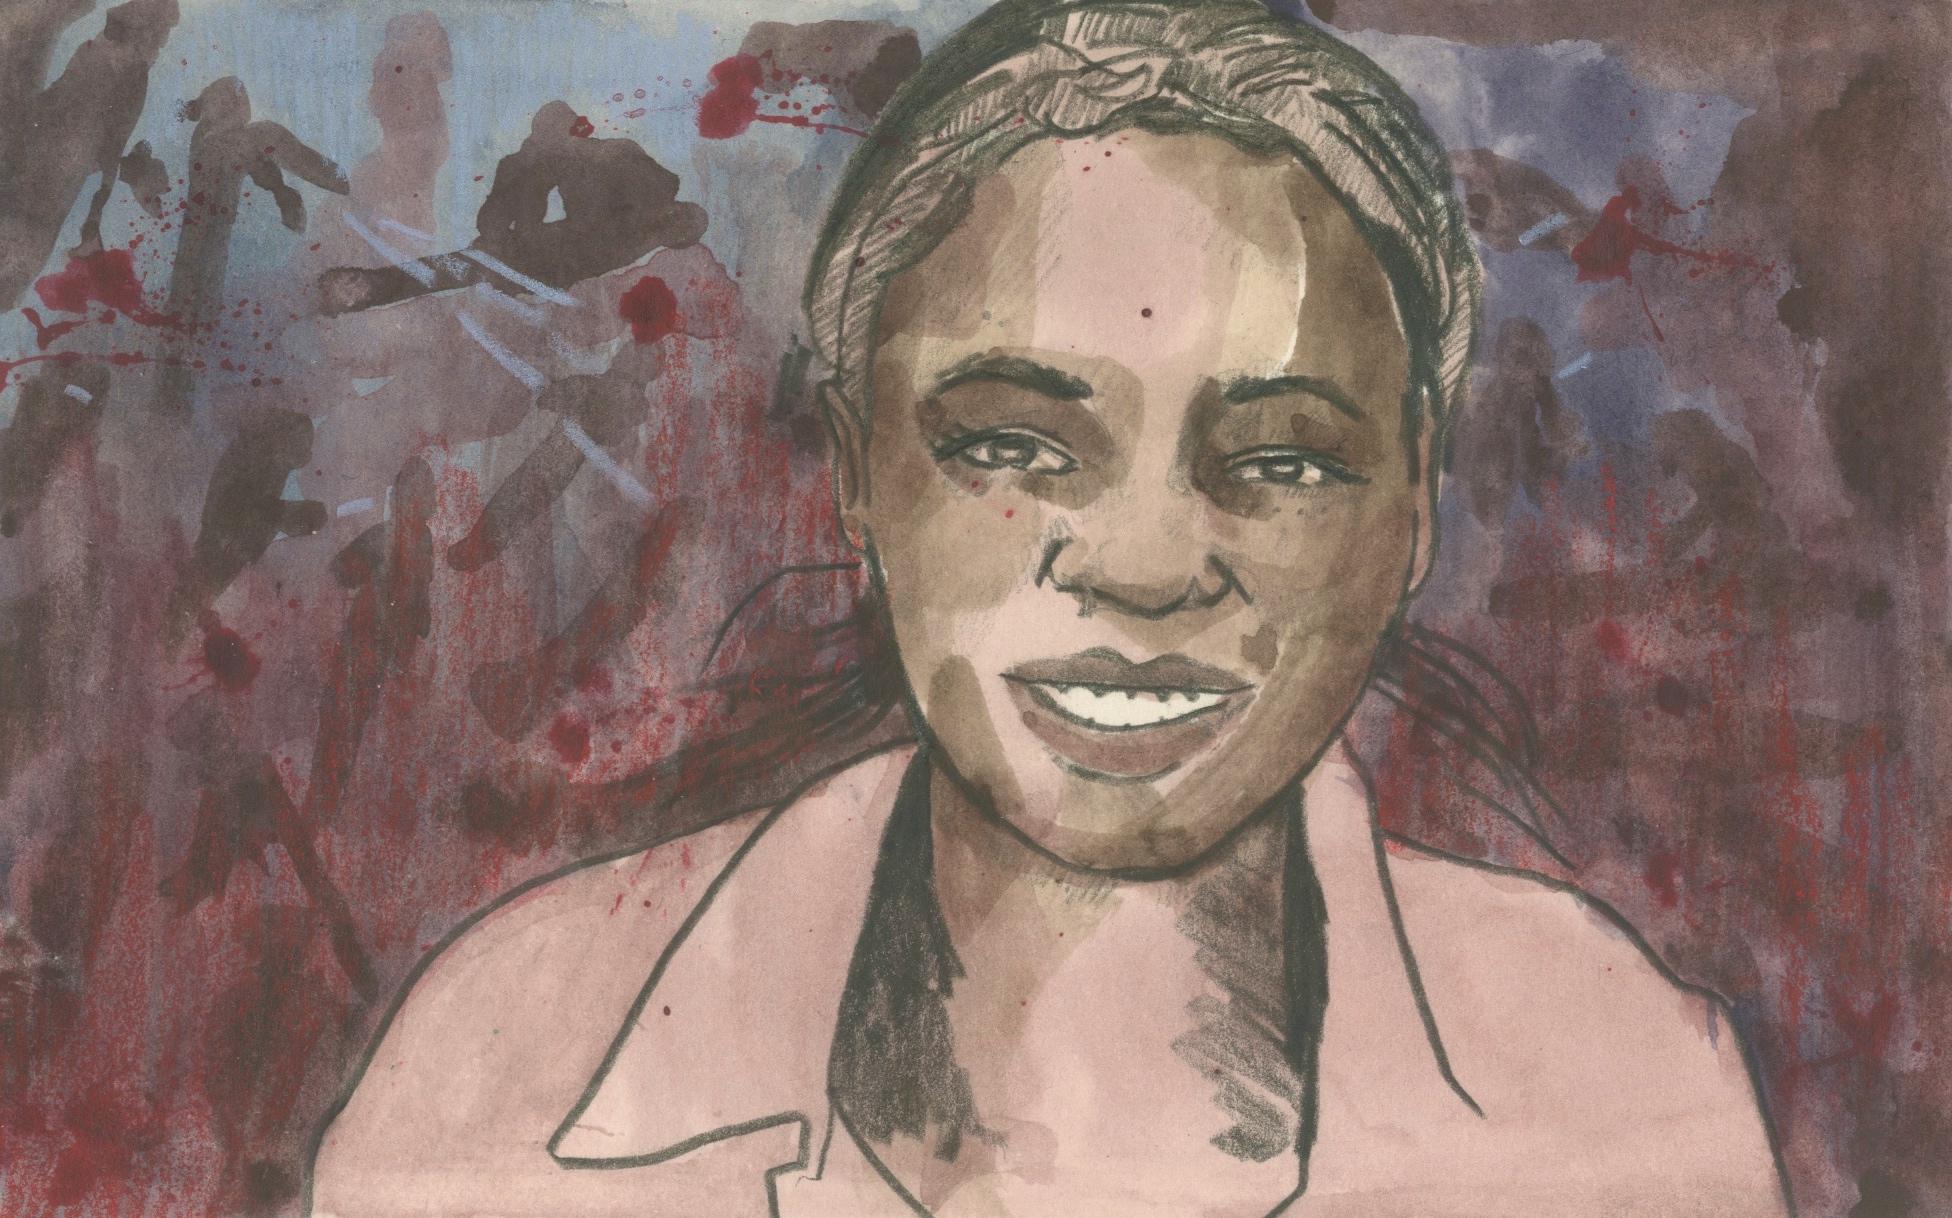 02/04/15Janet Akiniyi, a student at Garissa University College in Kenya. Al-Shabab gunmen rampaged through the university murdering 147 people including Janet